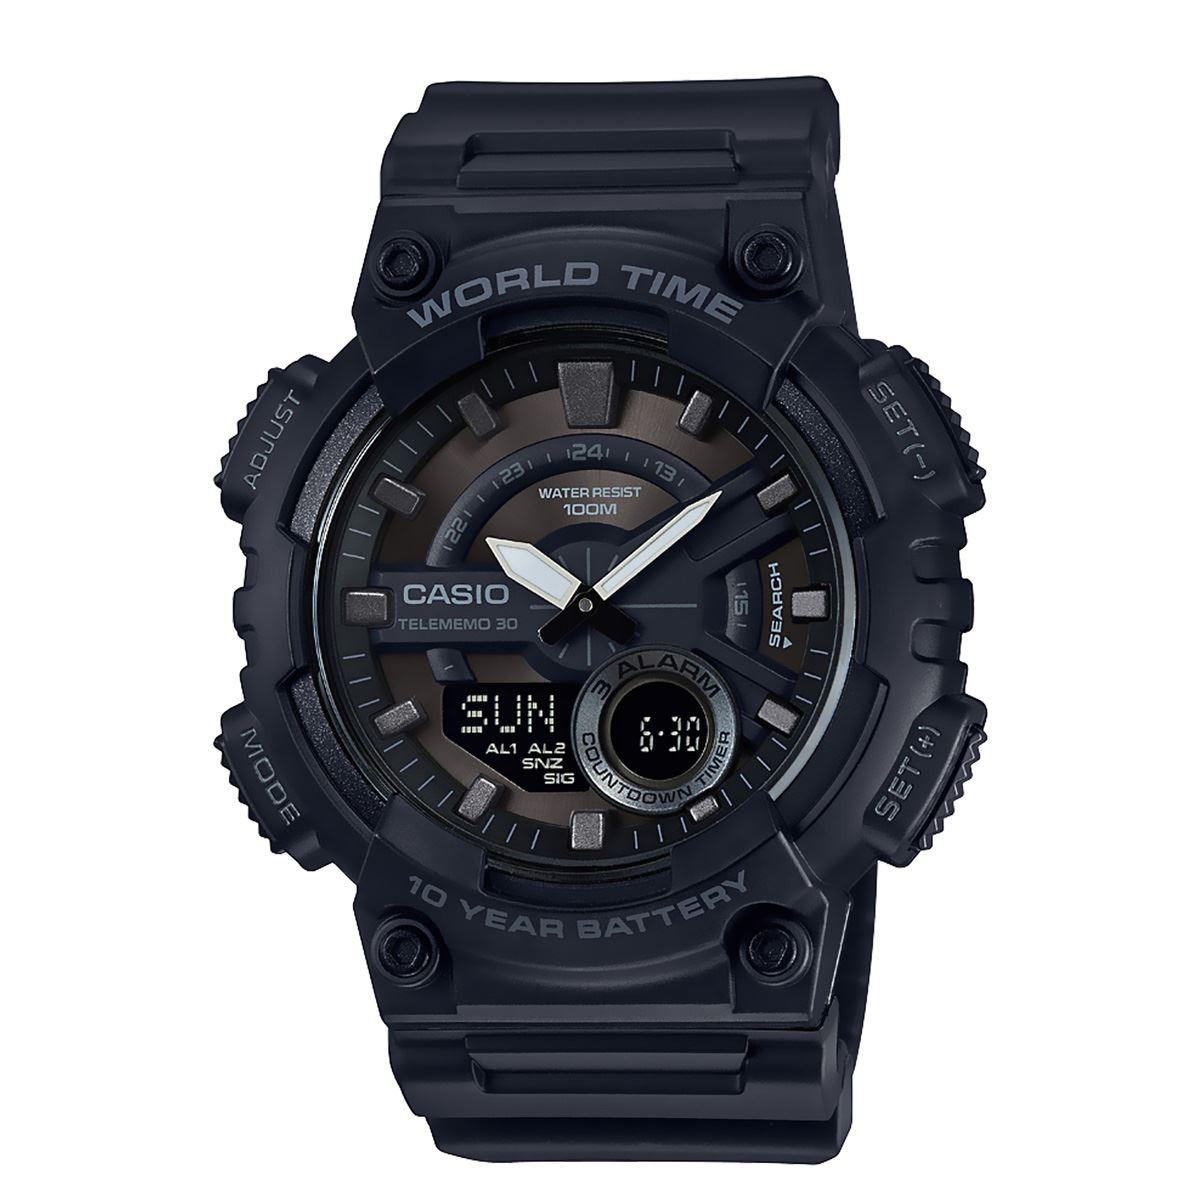 e4b19c959693 Reloj Casio Aeq-110w-1av Cronometro Alarma -   2.050